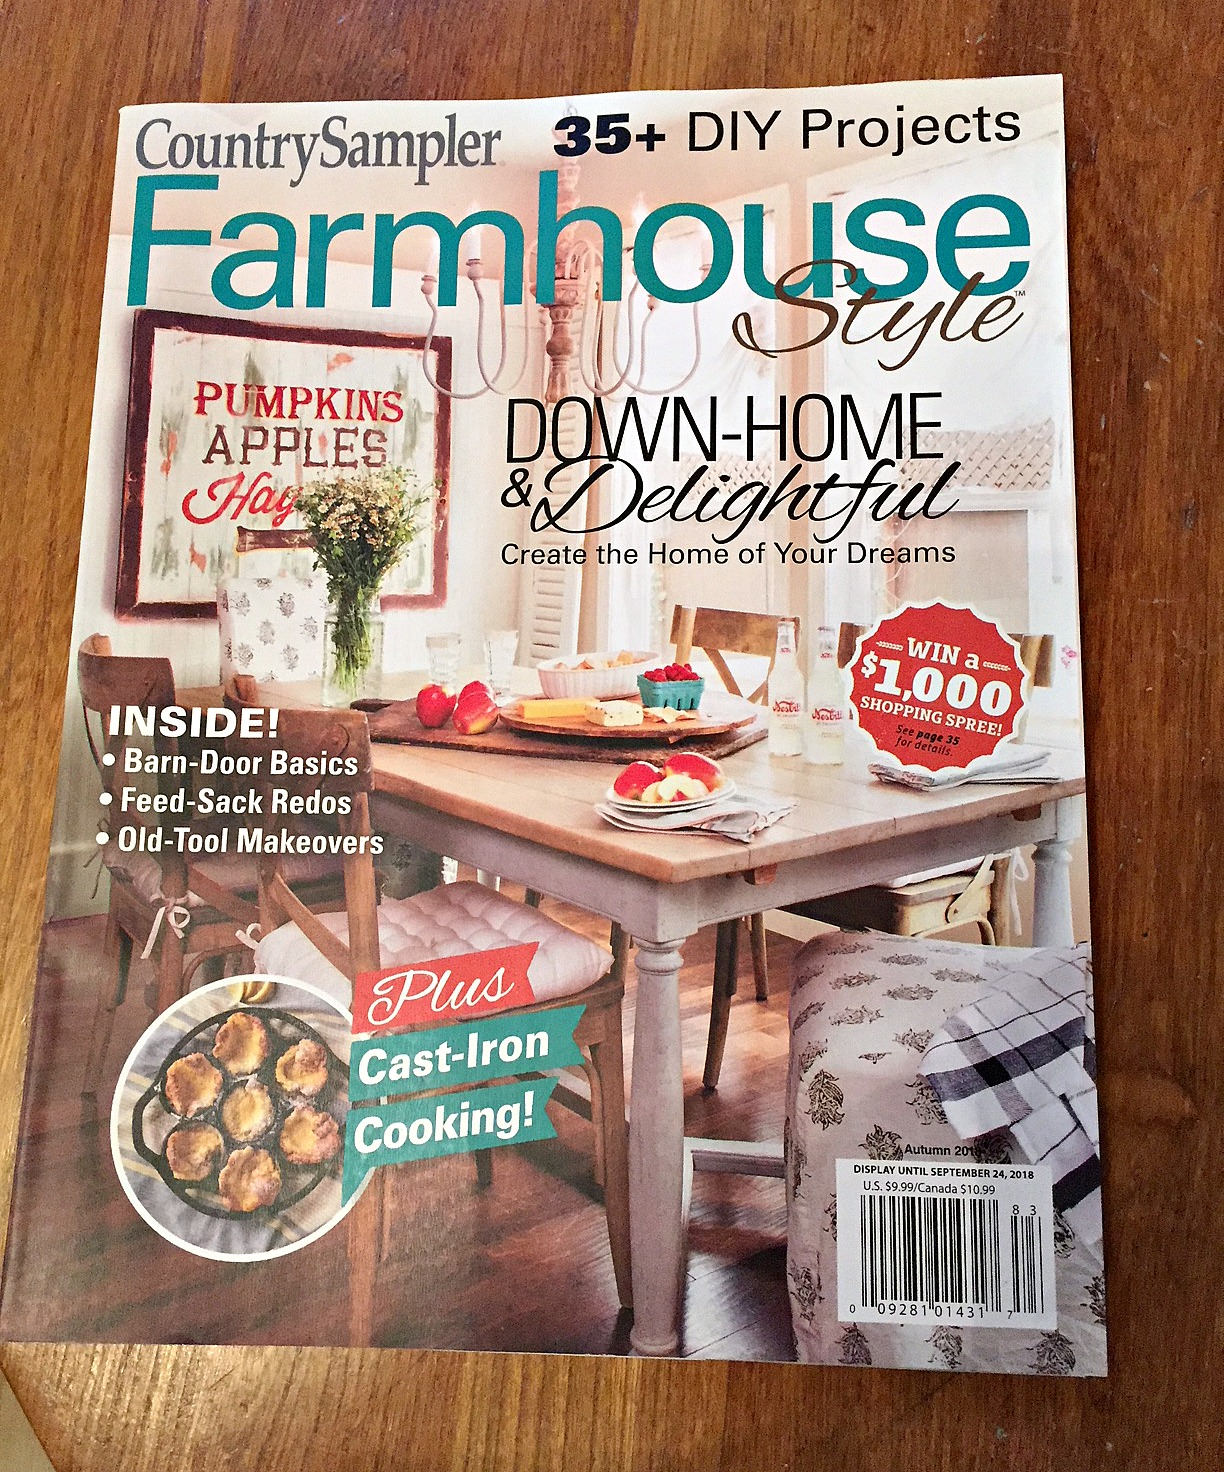 Junk Garden Ideas 2018 Edition: Country Sampler Farmhouse Style Magazine Feature